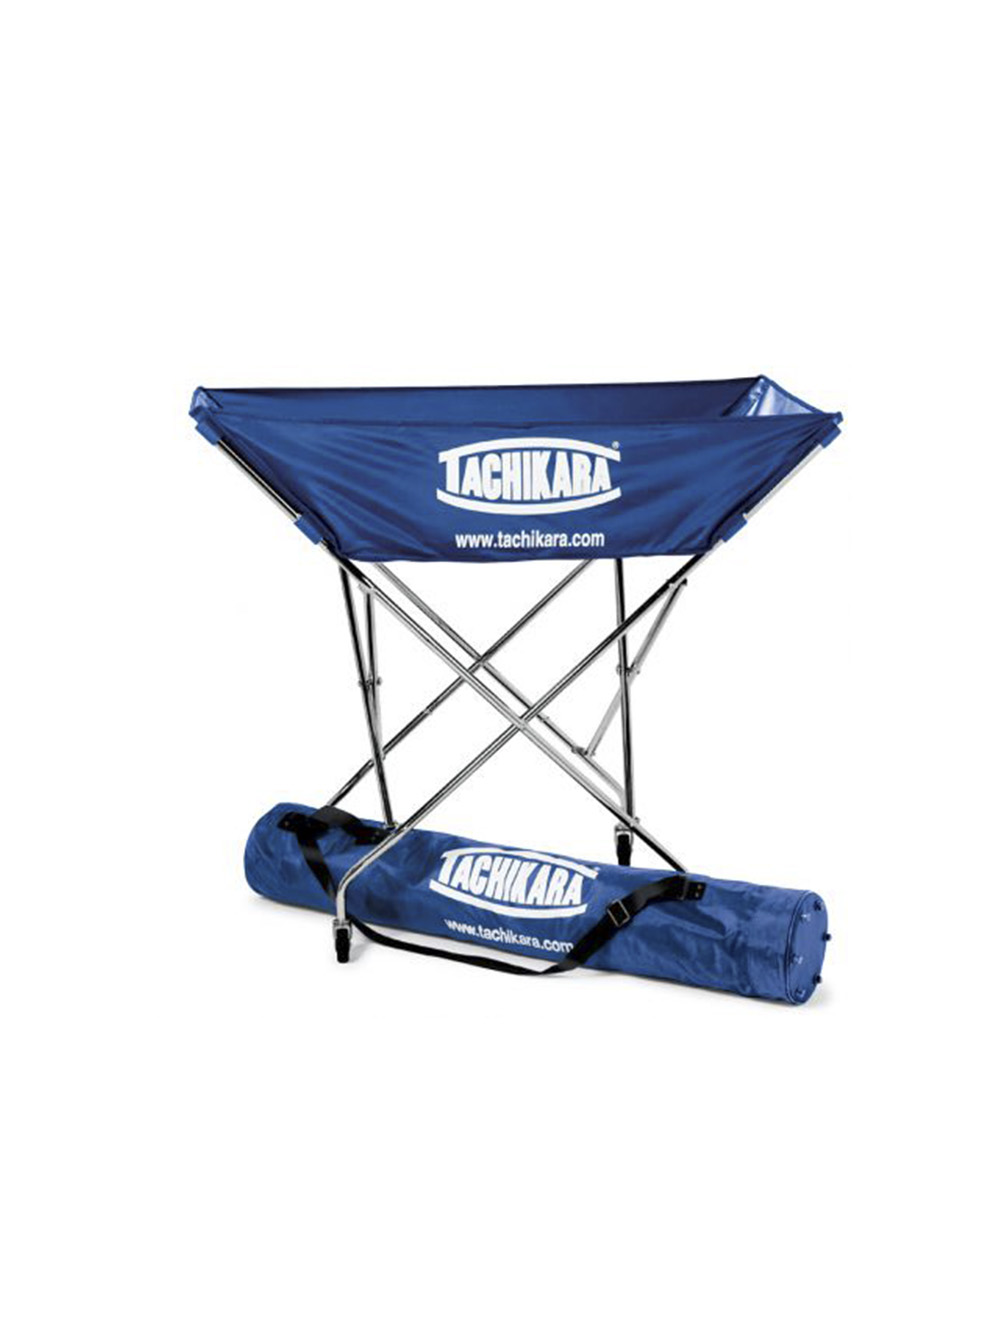 Tachikara Collapsible Hammock Ball Cart  Midwest